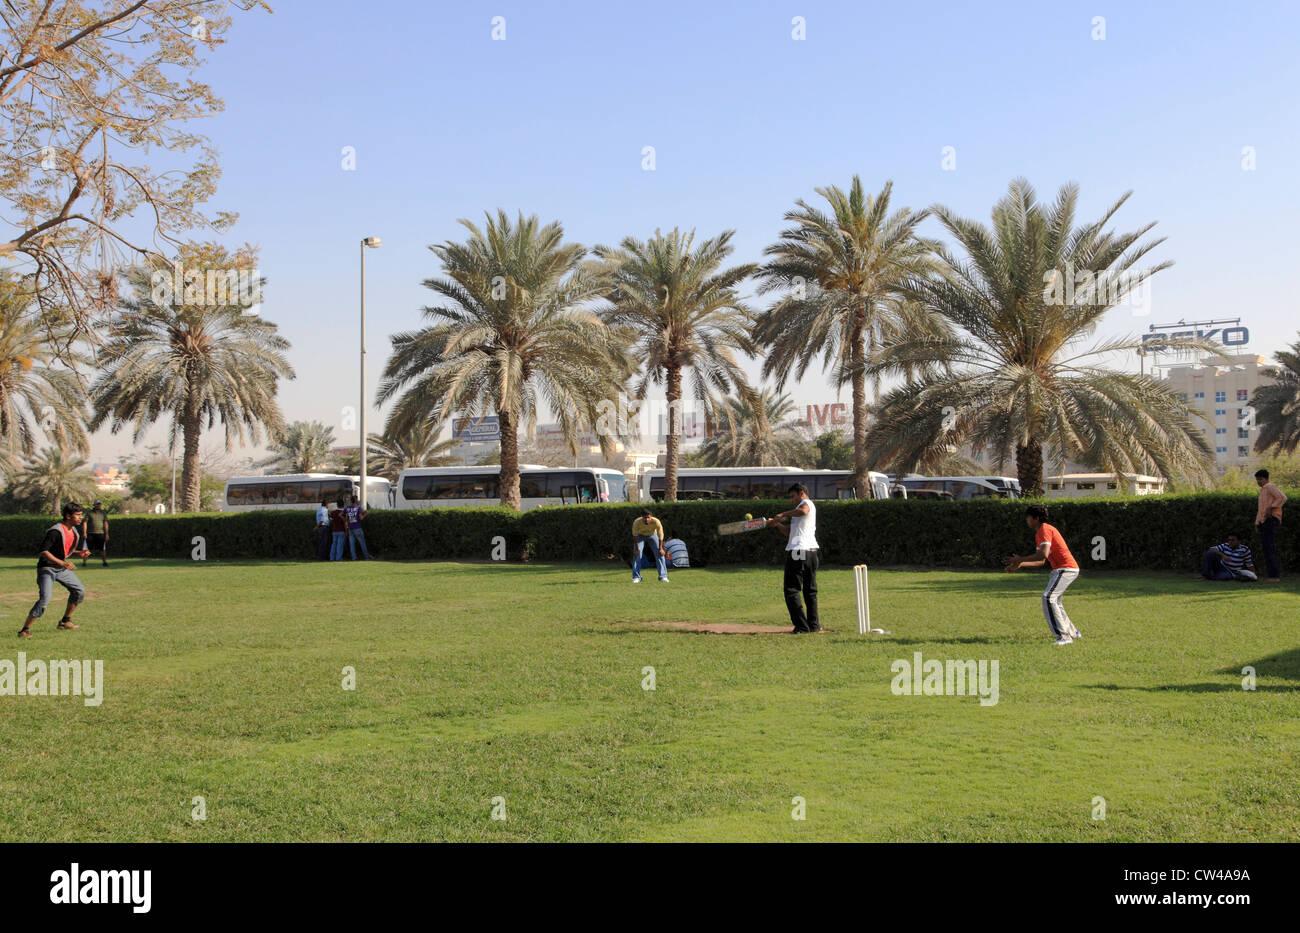 3499. Il cricket, Indiana e lavoratori Pakistani, Dubai, EAU. Immagini Stock